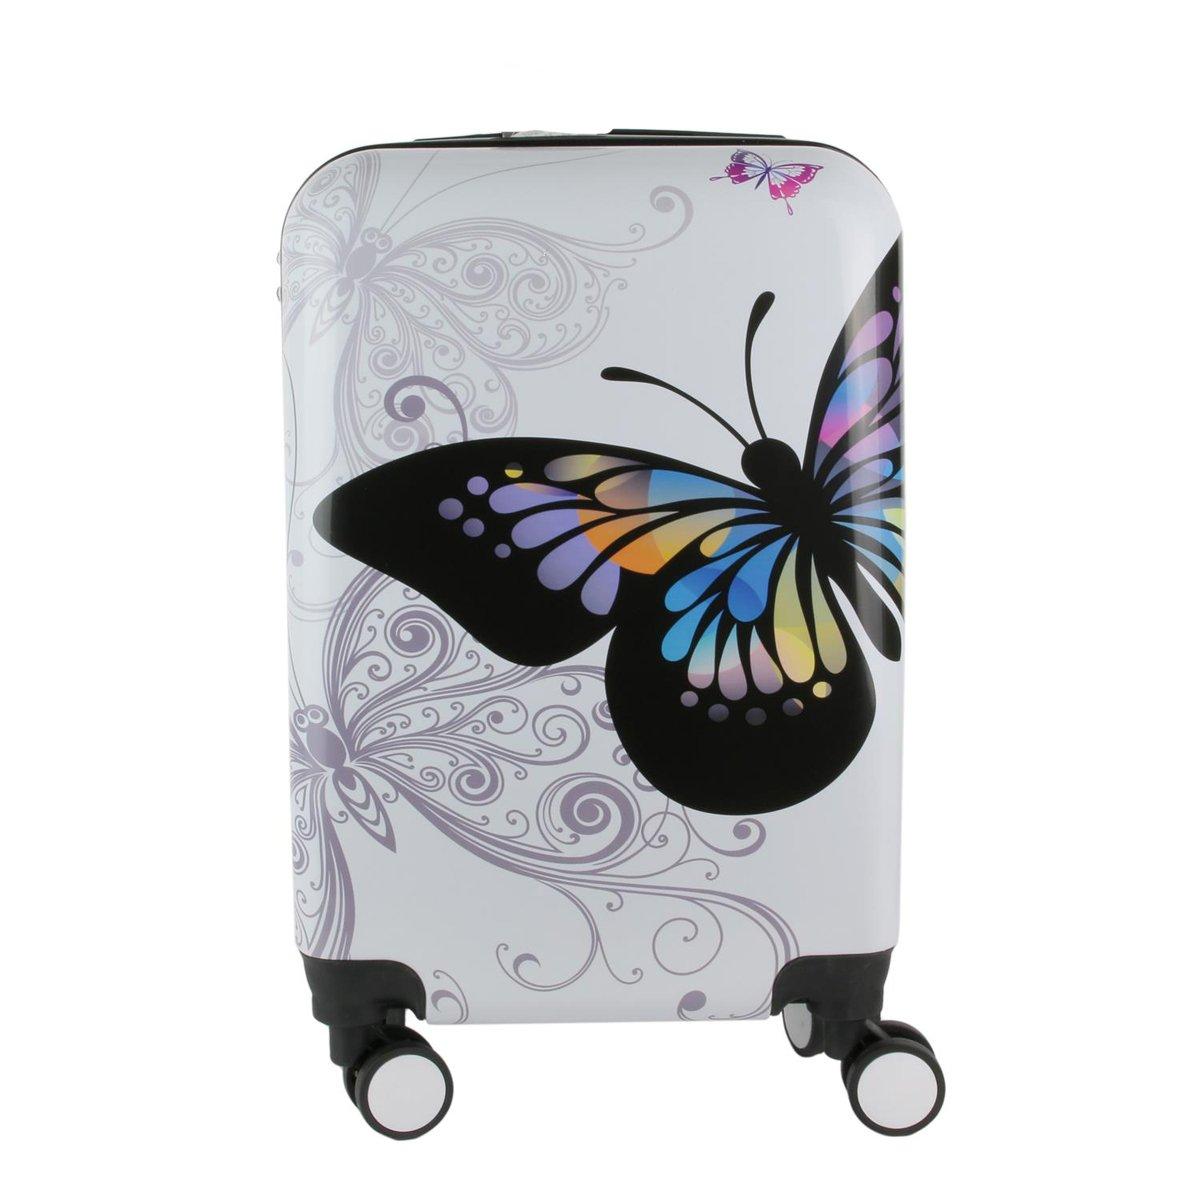 Les Trésors De Lily [Q0792] - Carretilla de abs Papillons blanco multicolor - 50x35x23 cm (48l).: Amazon.es: Equipaje